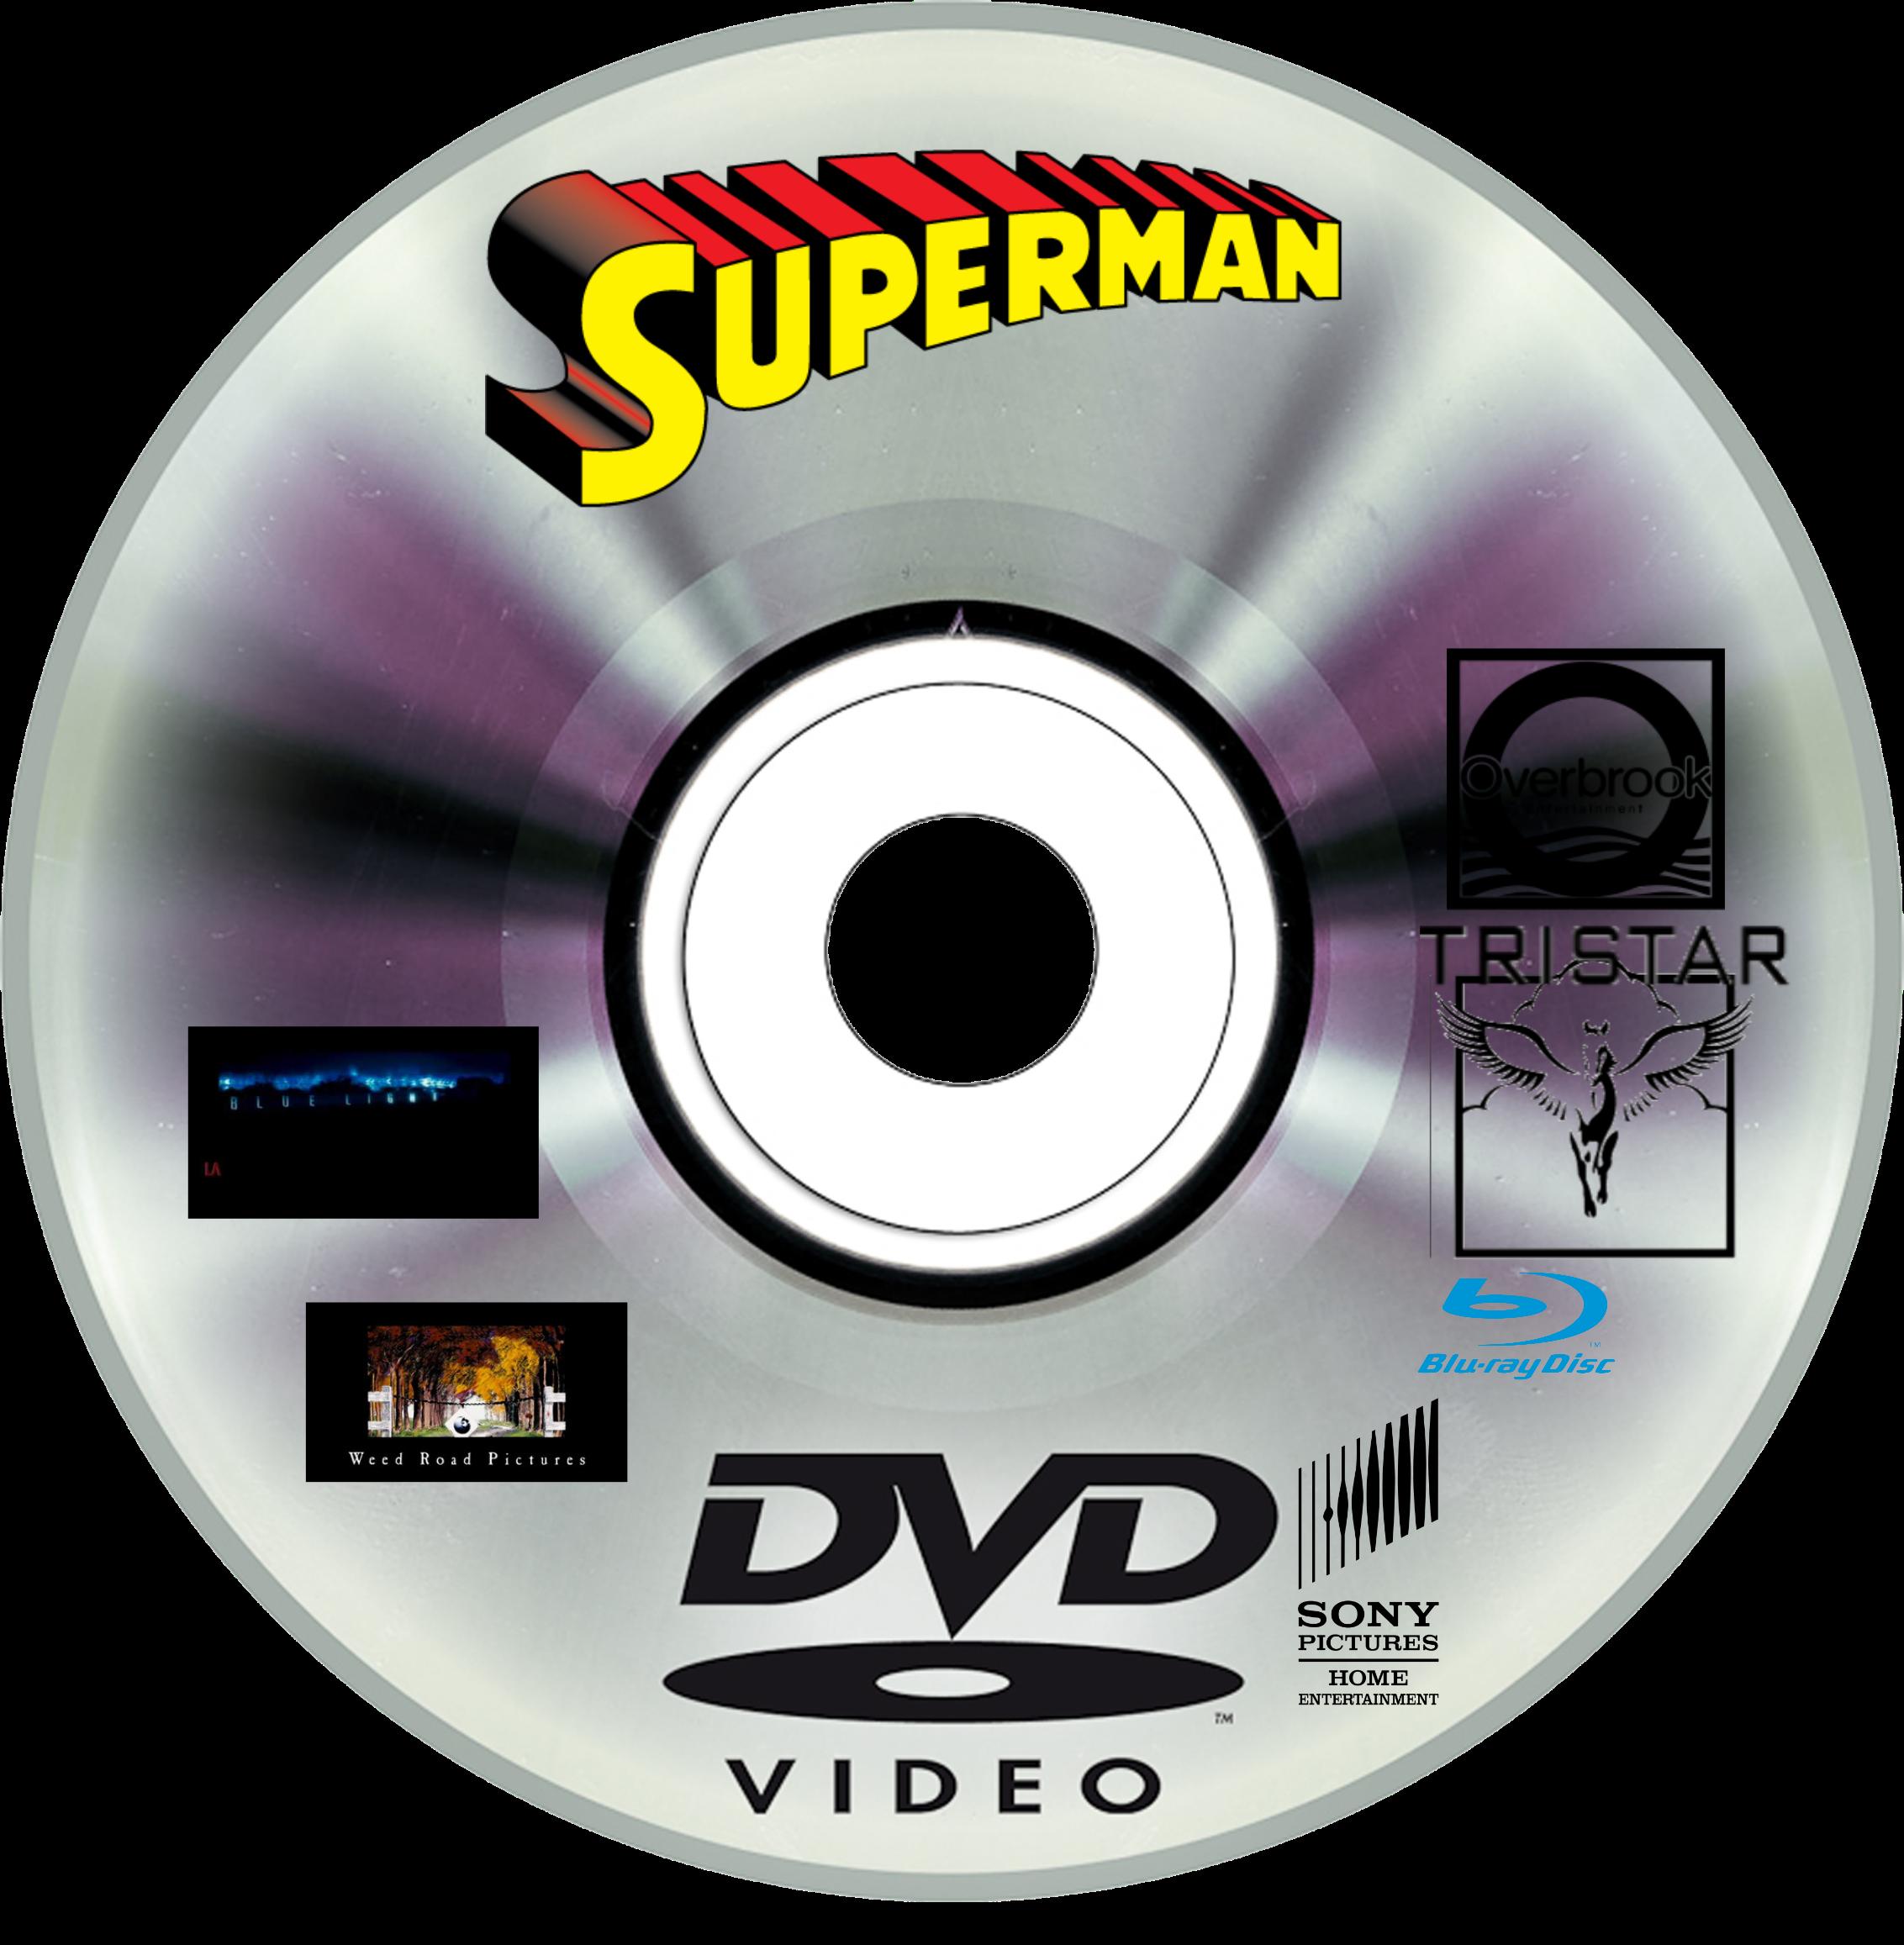 Superman 2008 Full Image By Kenyattastanton 12